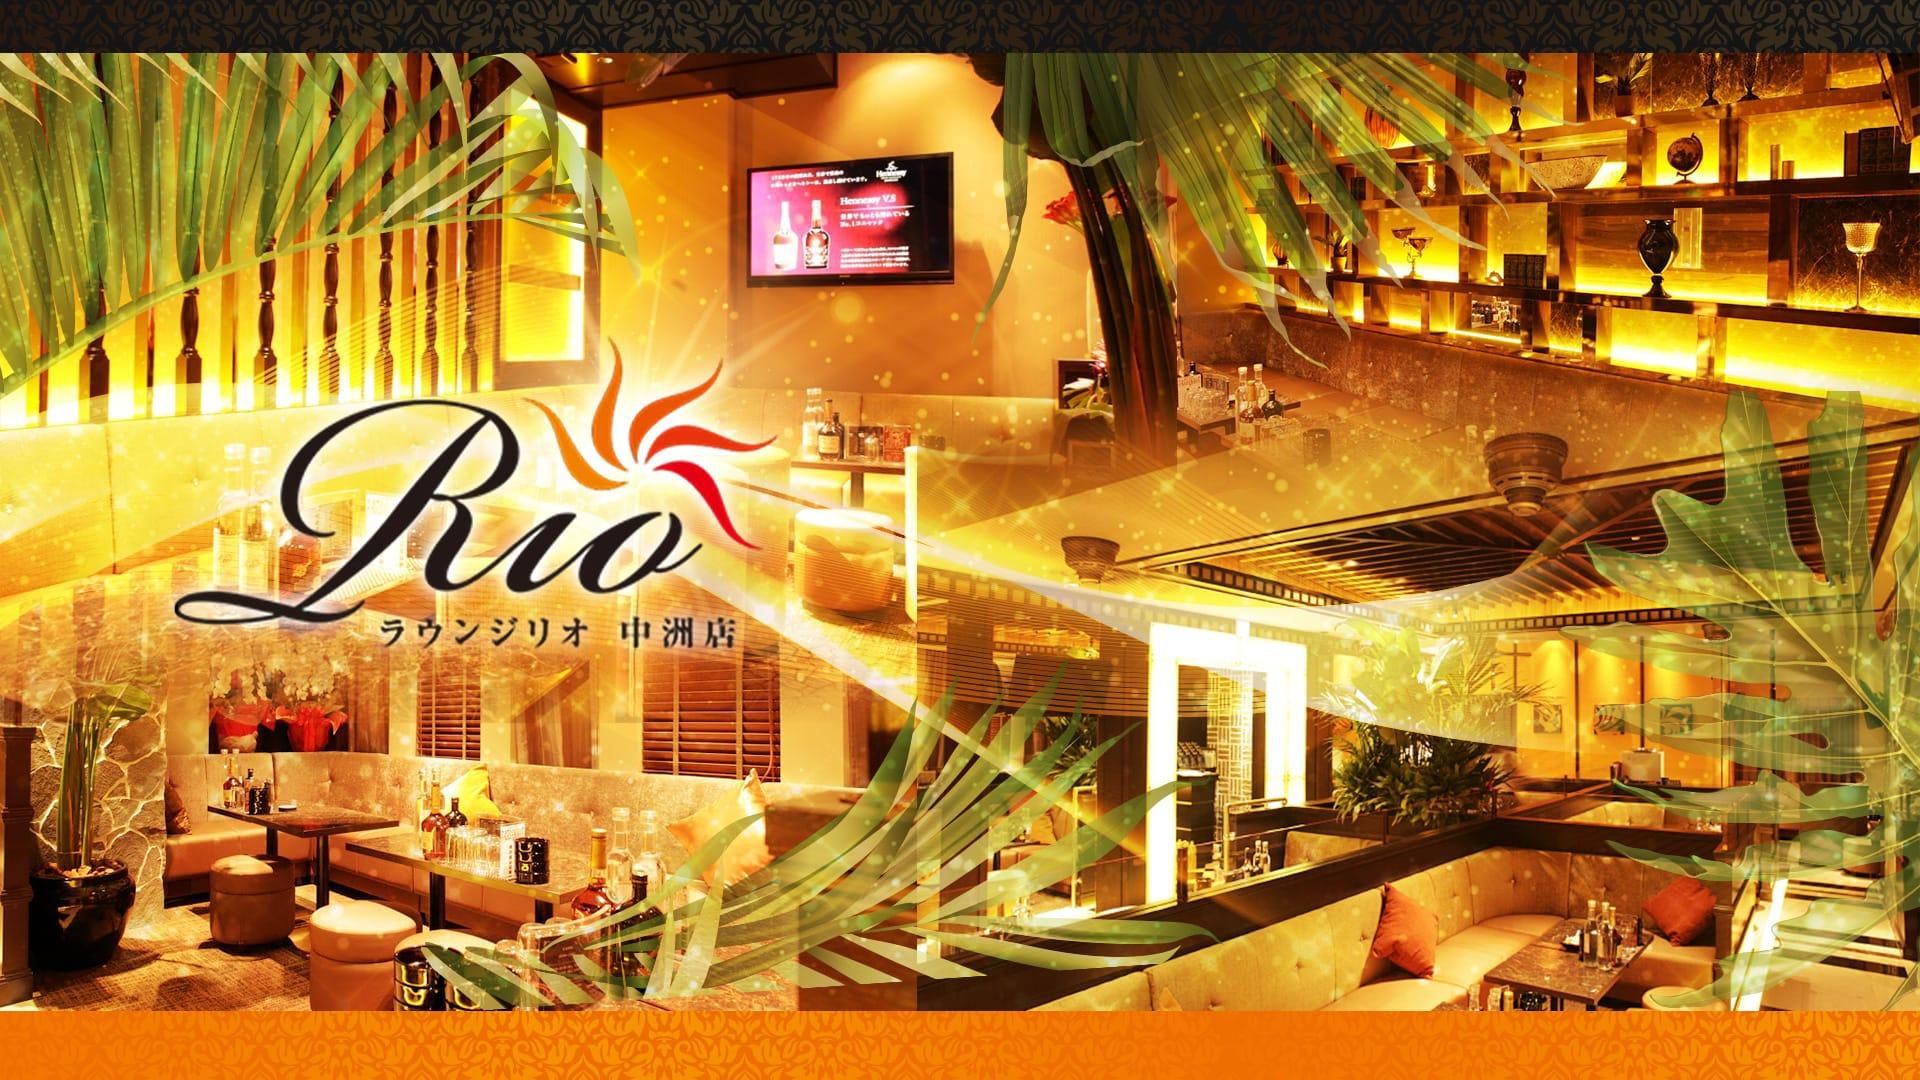 Lounge Rio 中洲(リオ) 中洲キャバクラ TOP画像